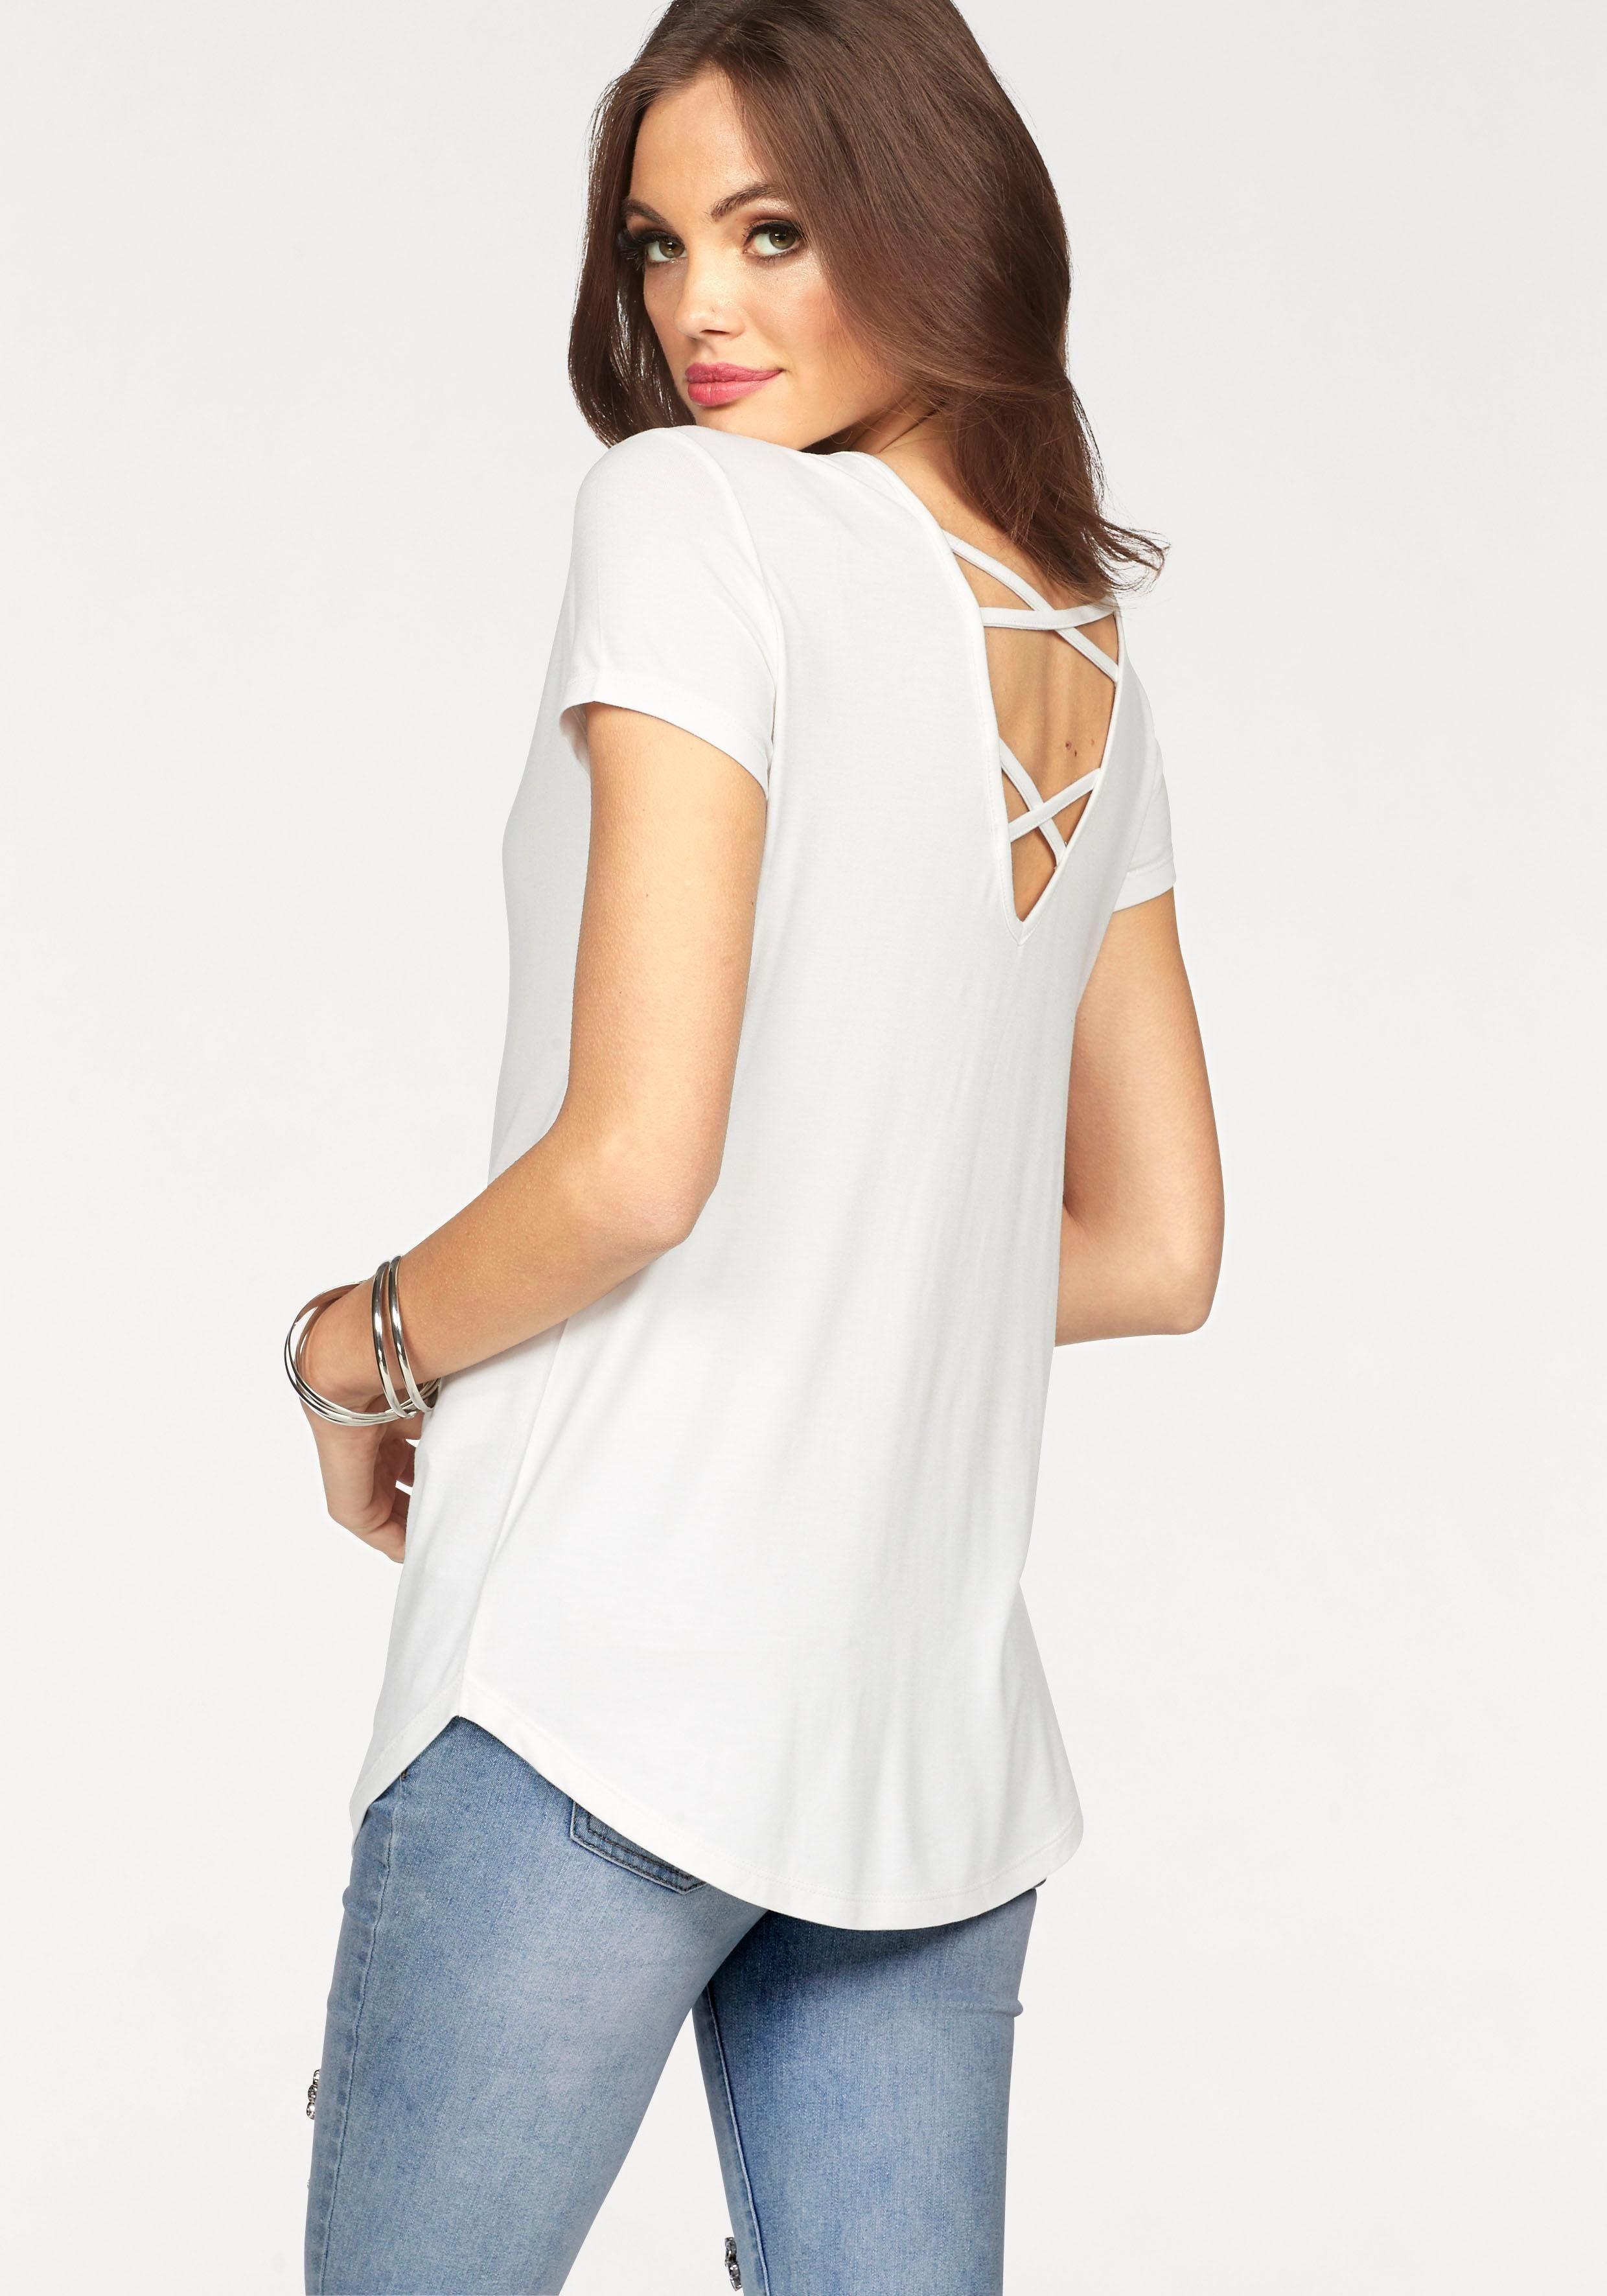 Melrose Rundhalsshirt mit gekreuztem Rückenausschnitt